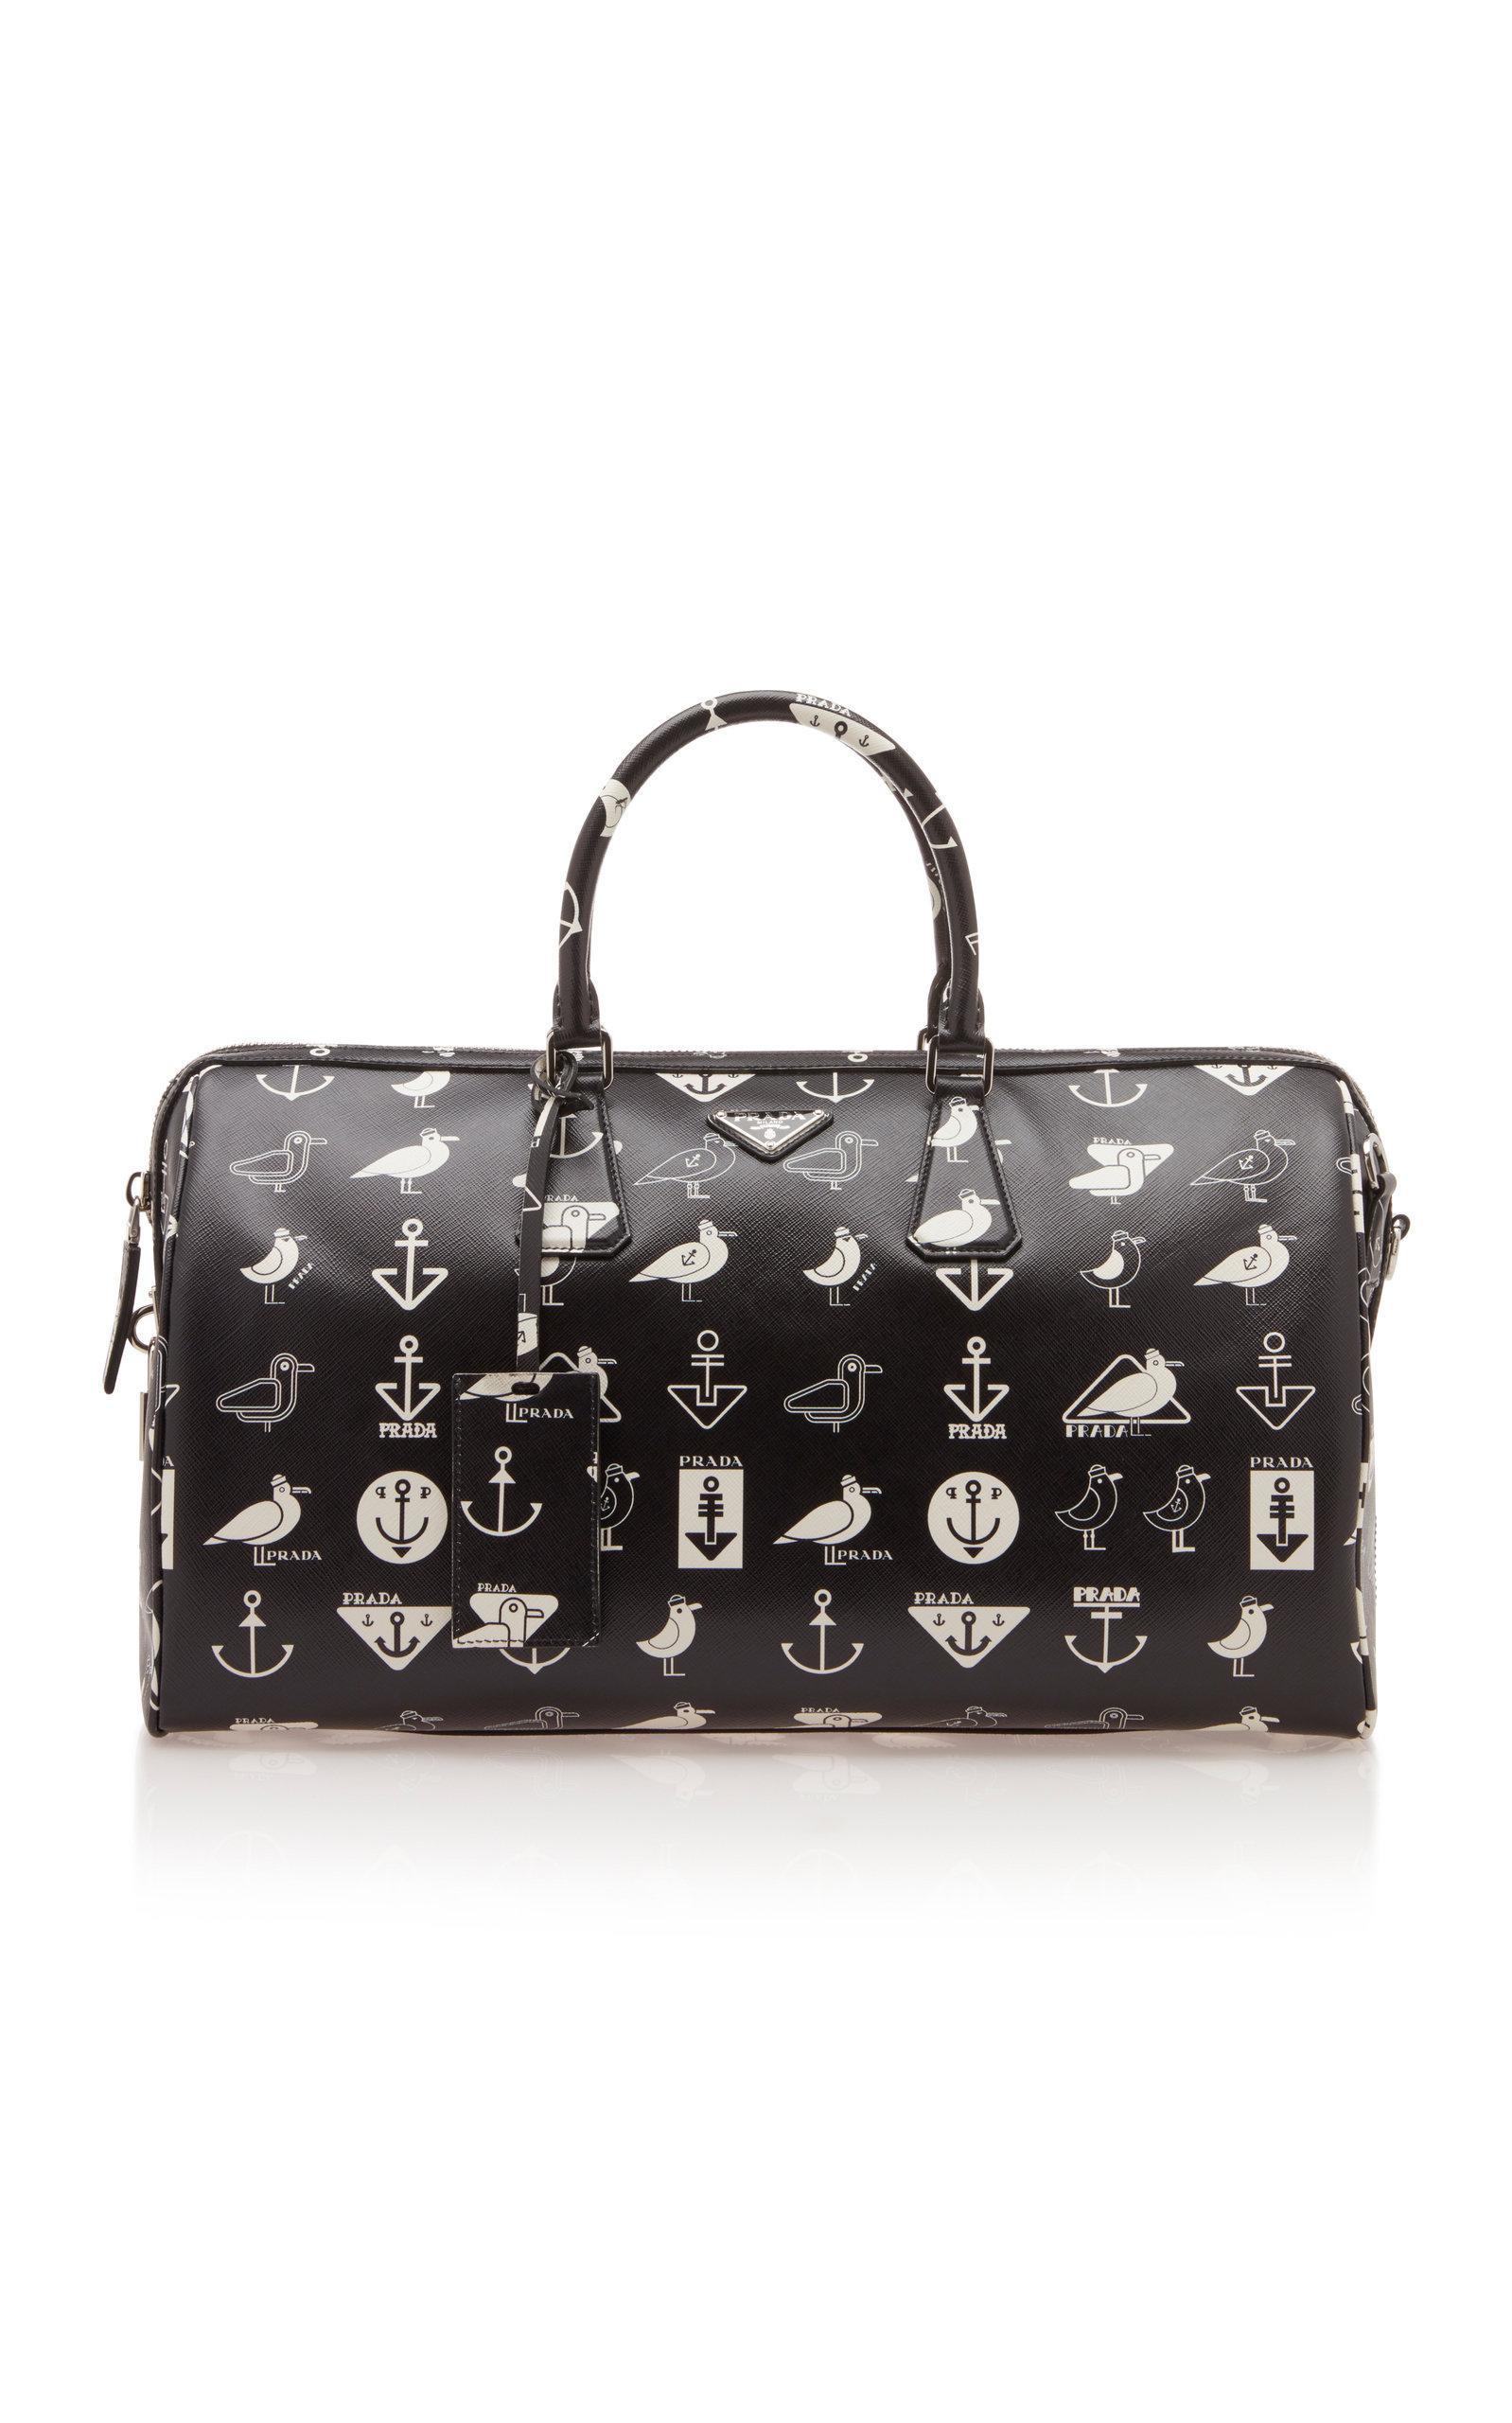 8830aa2f8a67 Prada - Black Nautical-print Leather Gym Bag for Men - Lyst. View fullscreen